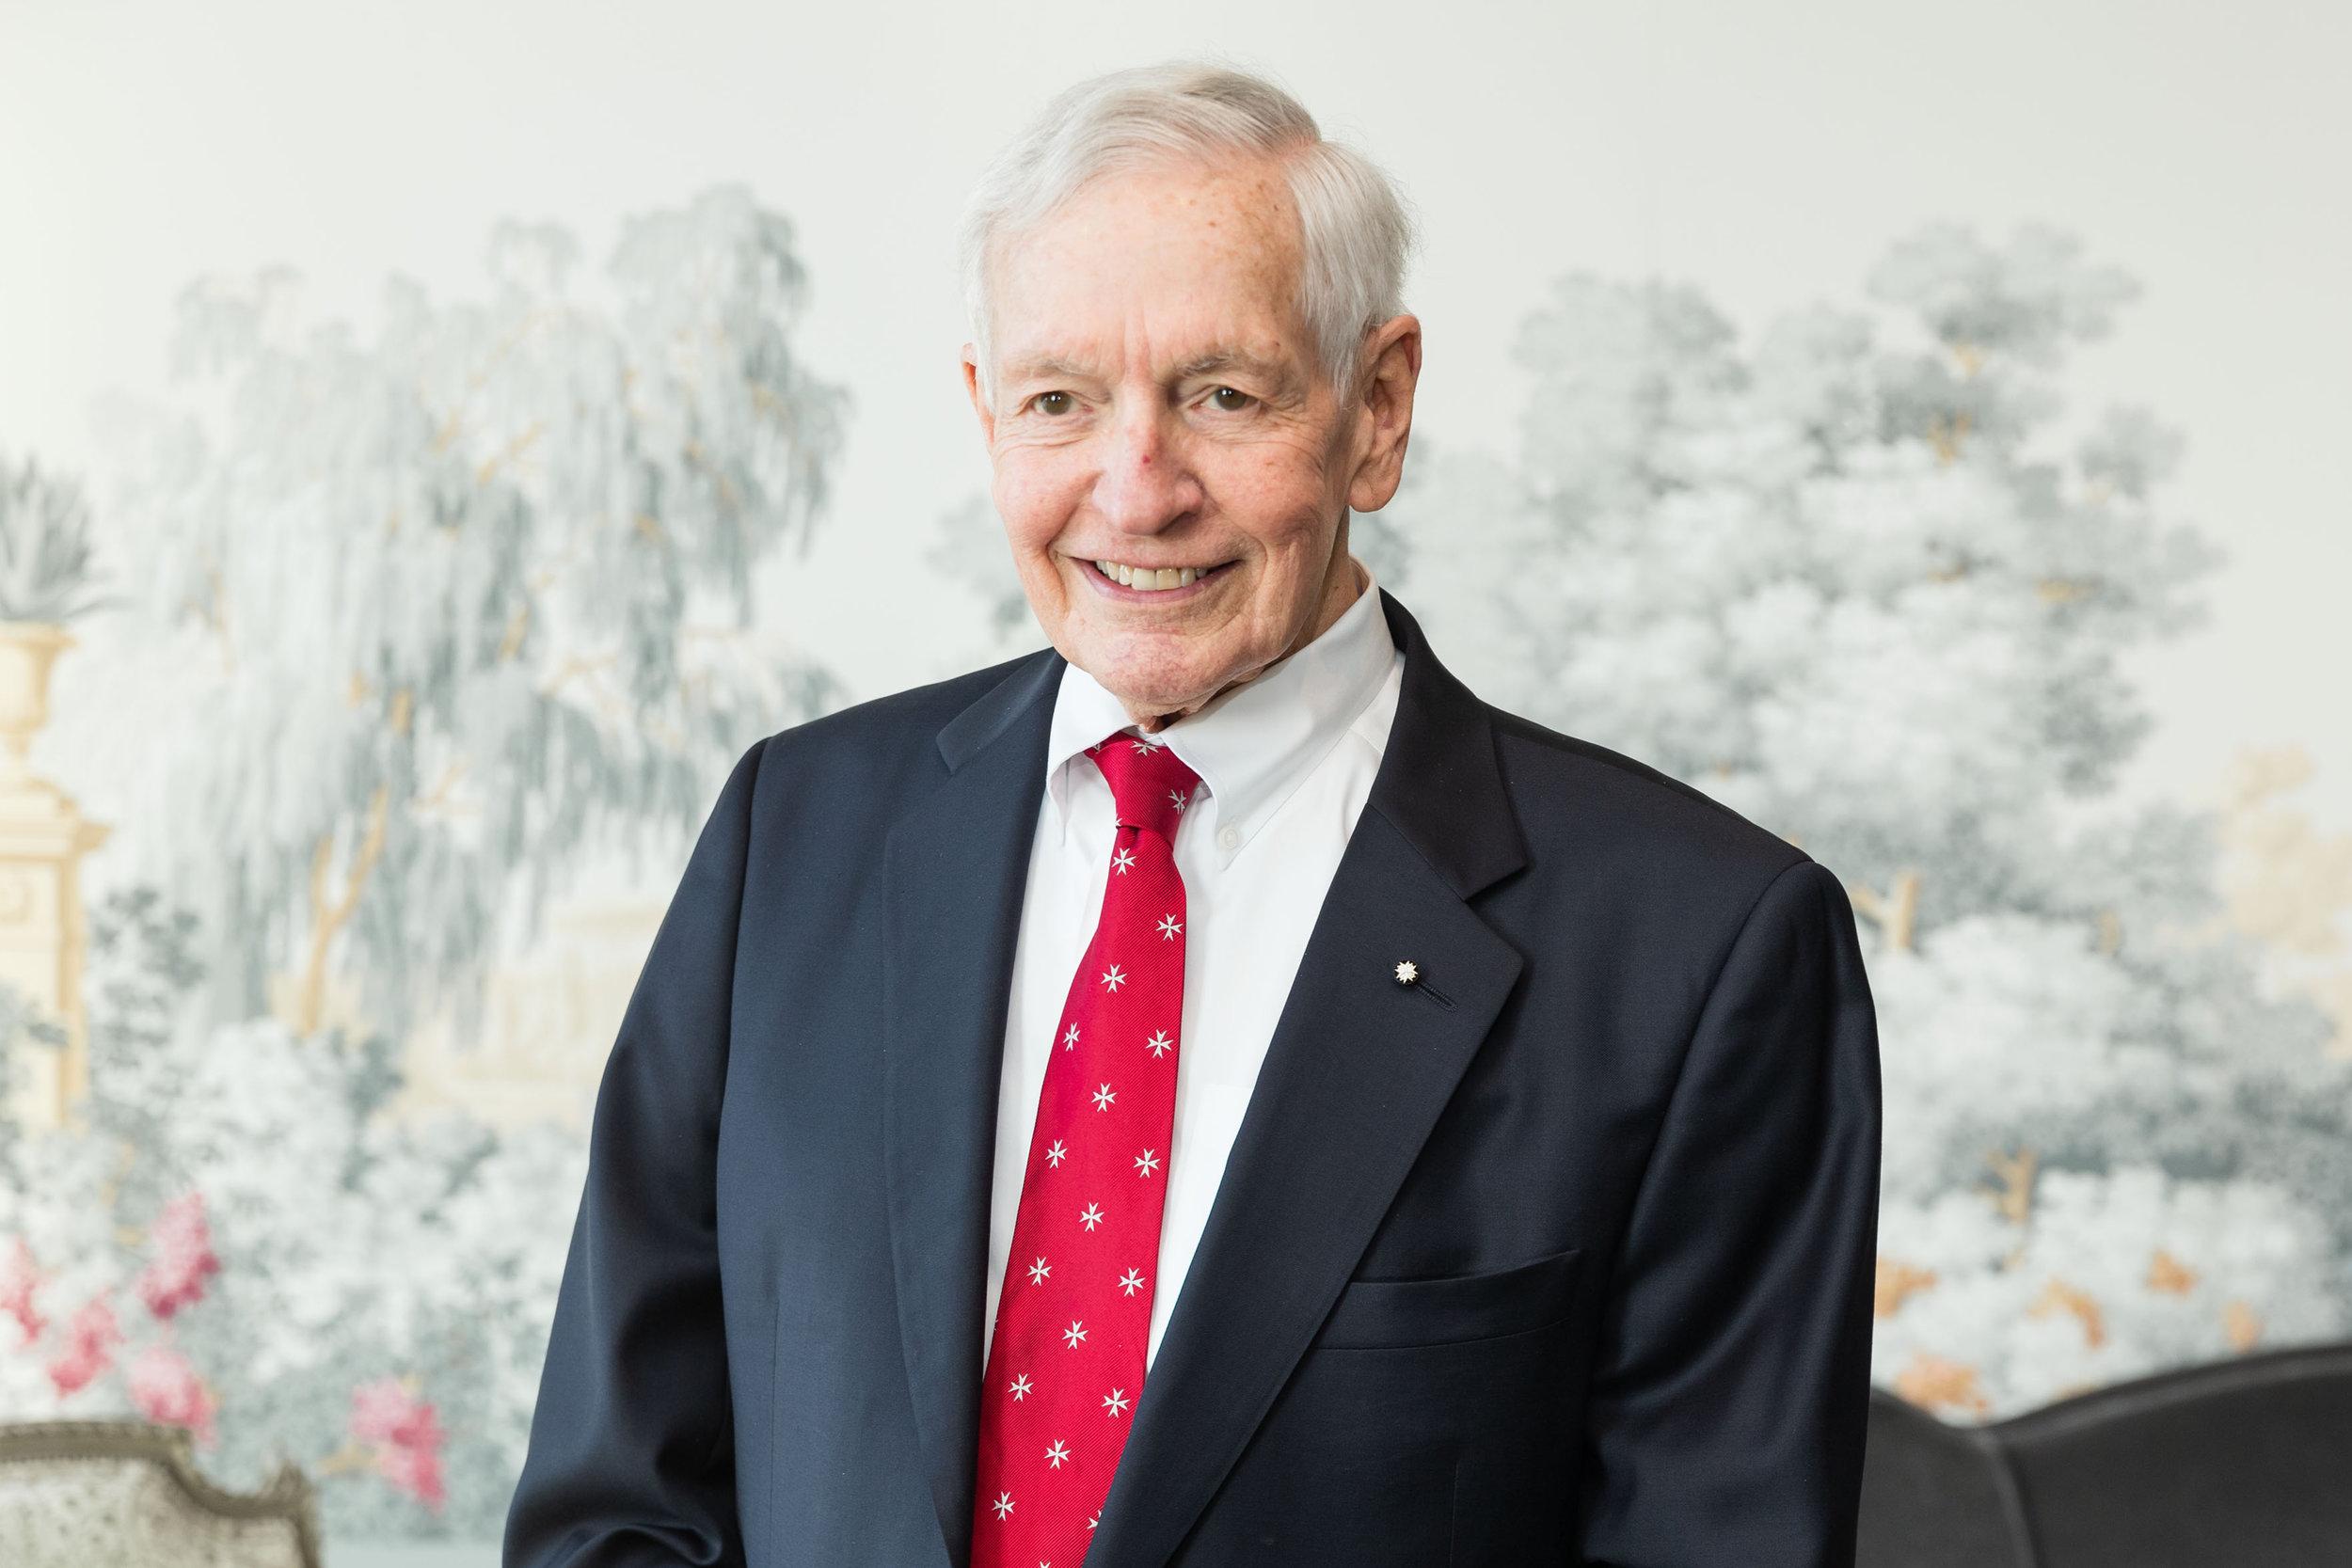 L.J. Michael Lambert, KM <br><em> Retired Financial Services Executive</em>